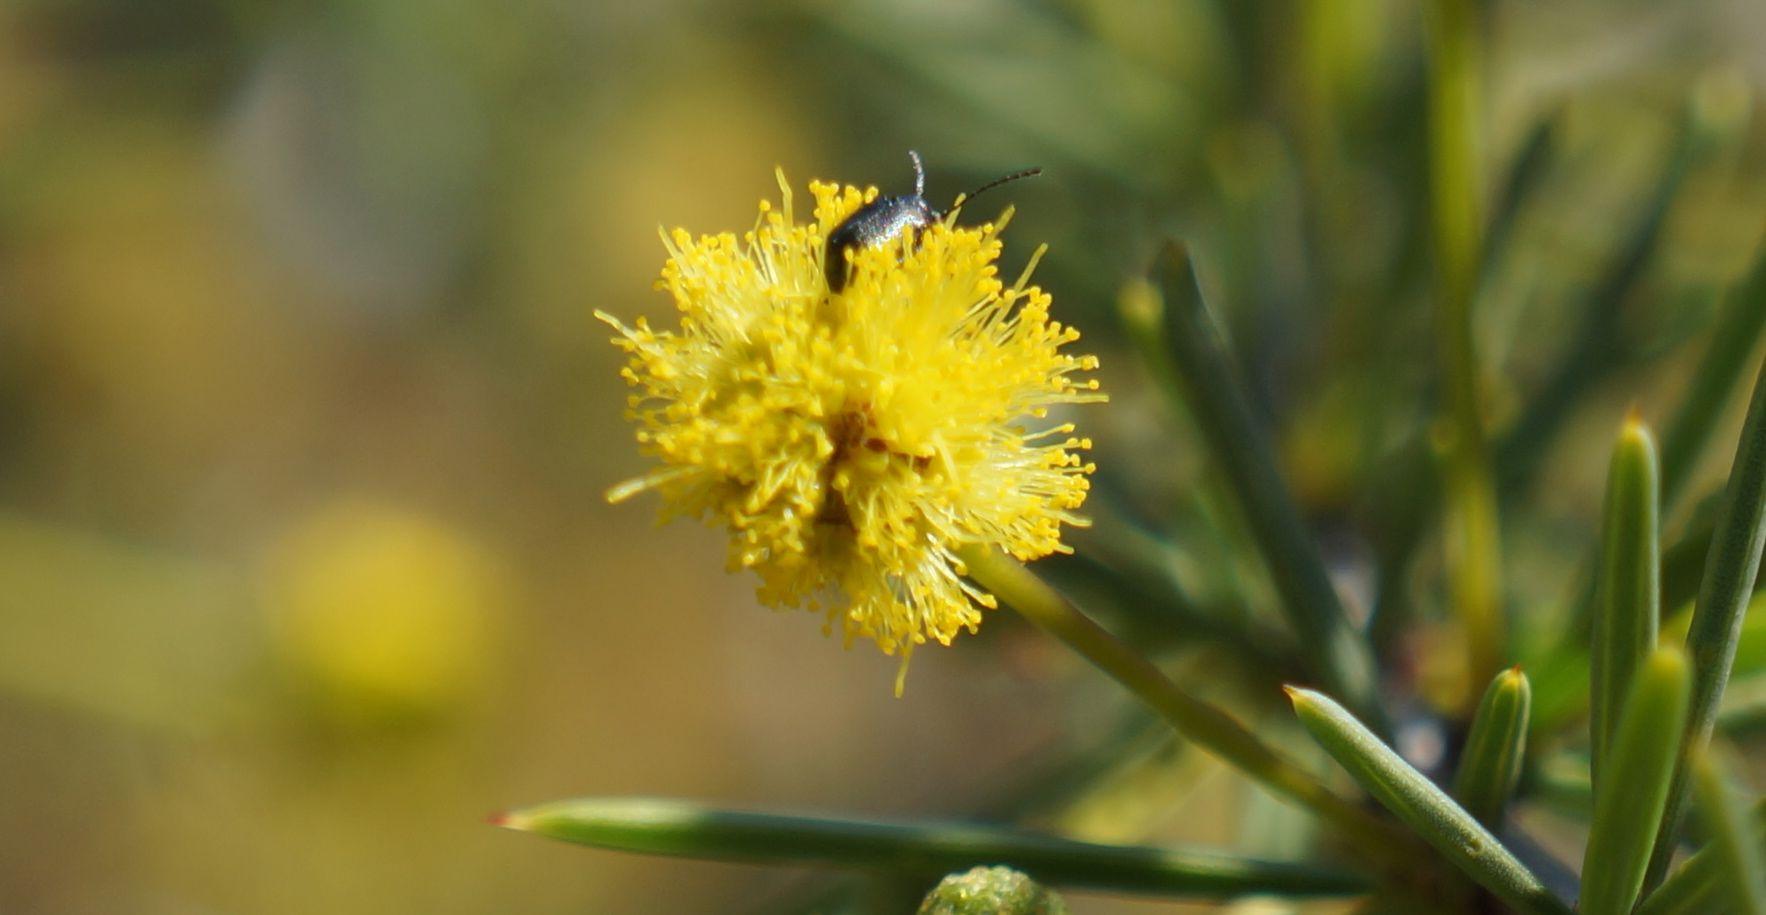 Some desert flowers from alice springs sentio opbg cassia beetle on acacia flower mightylinksfo